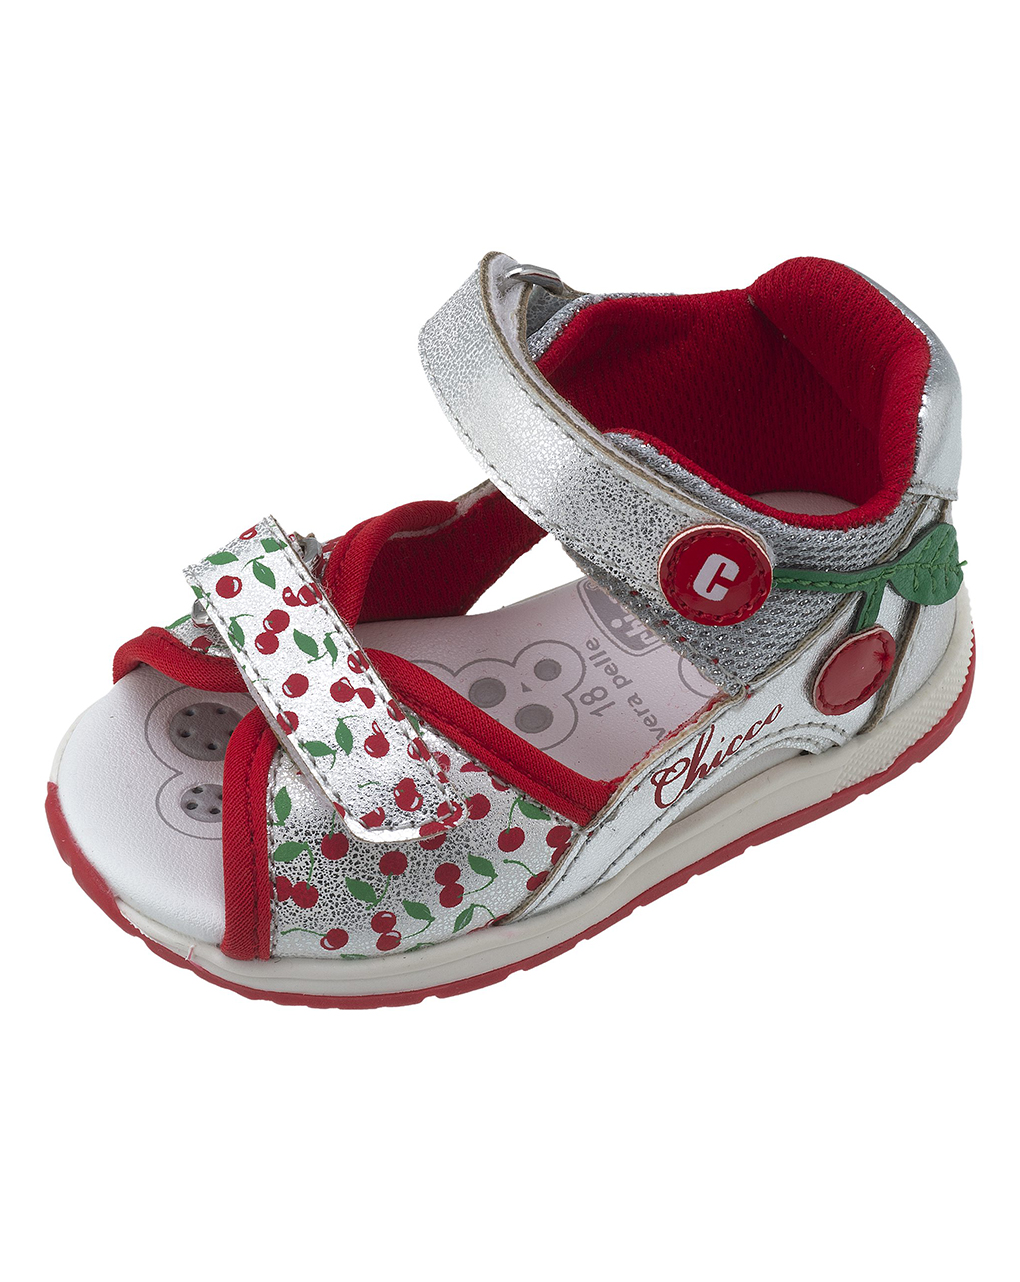 Sandalo femmina glorys - Chicco